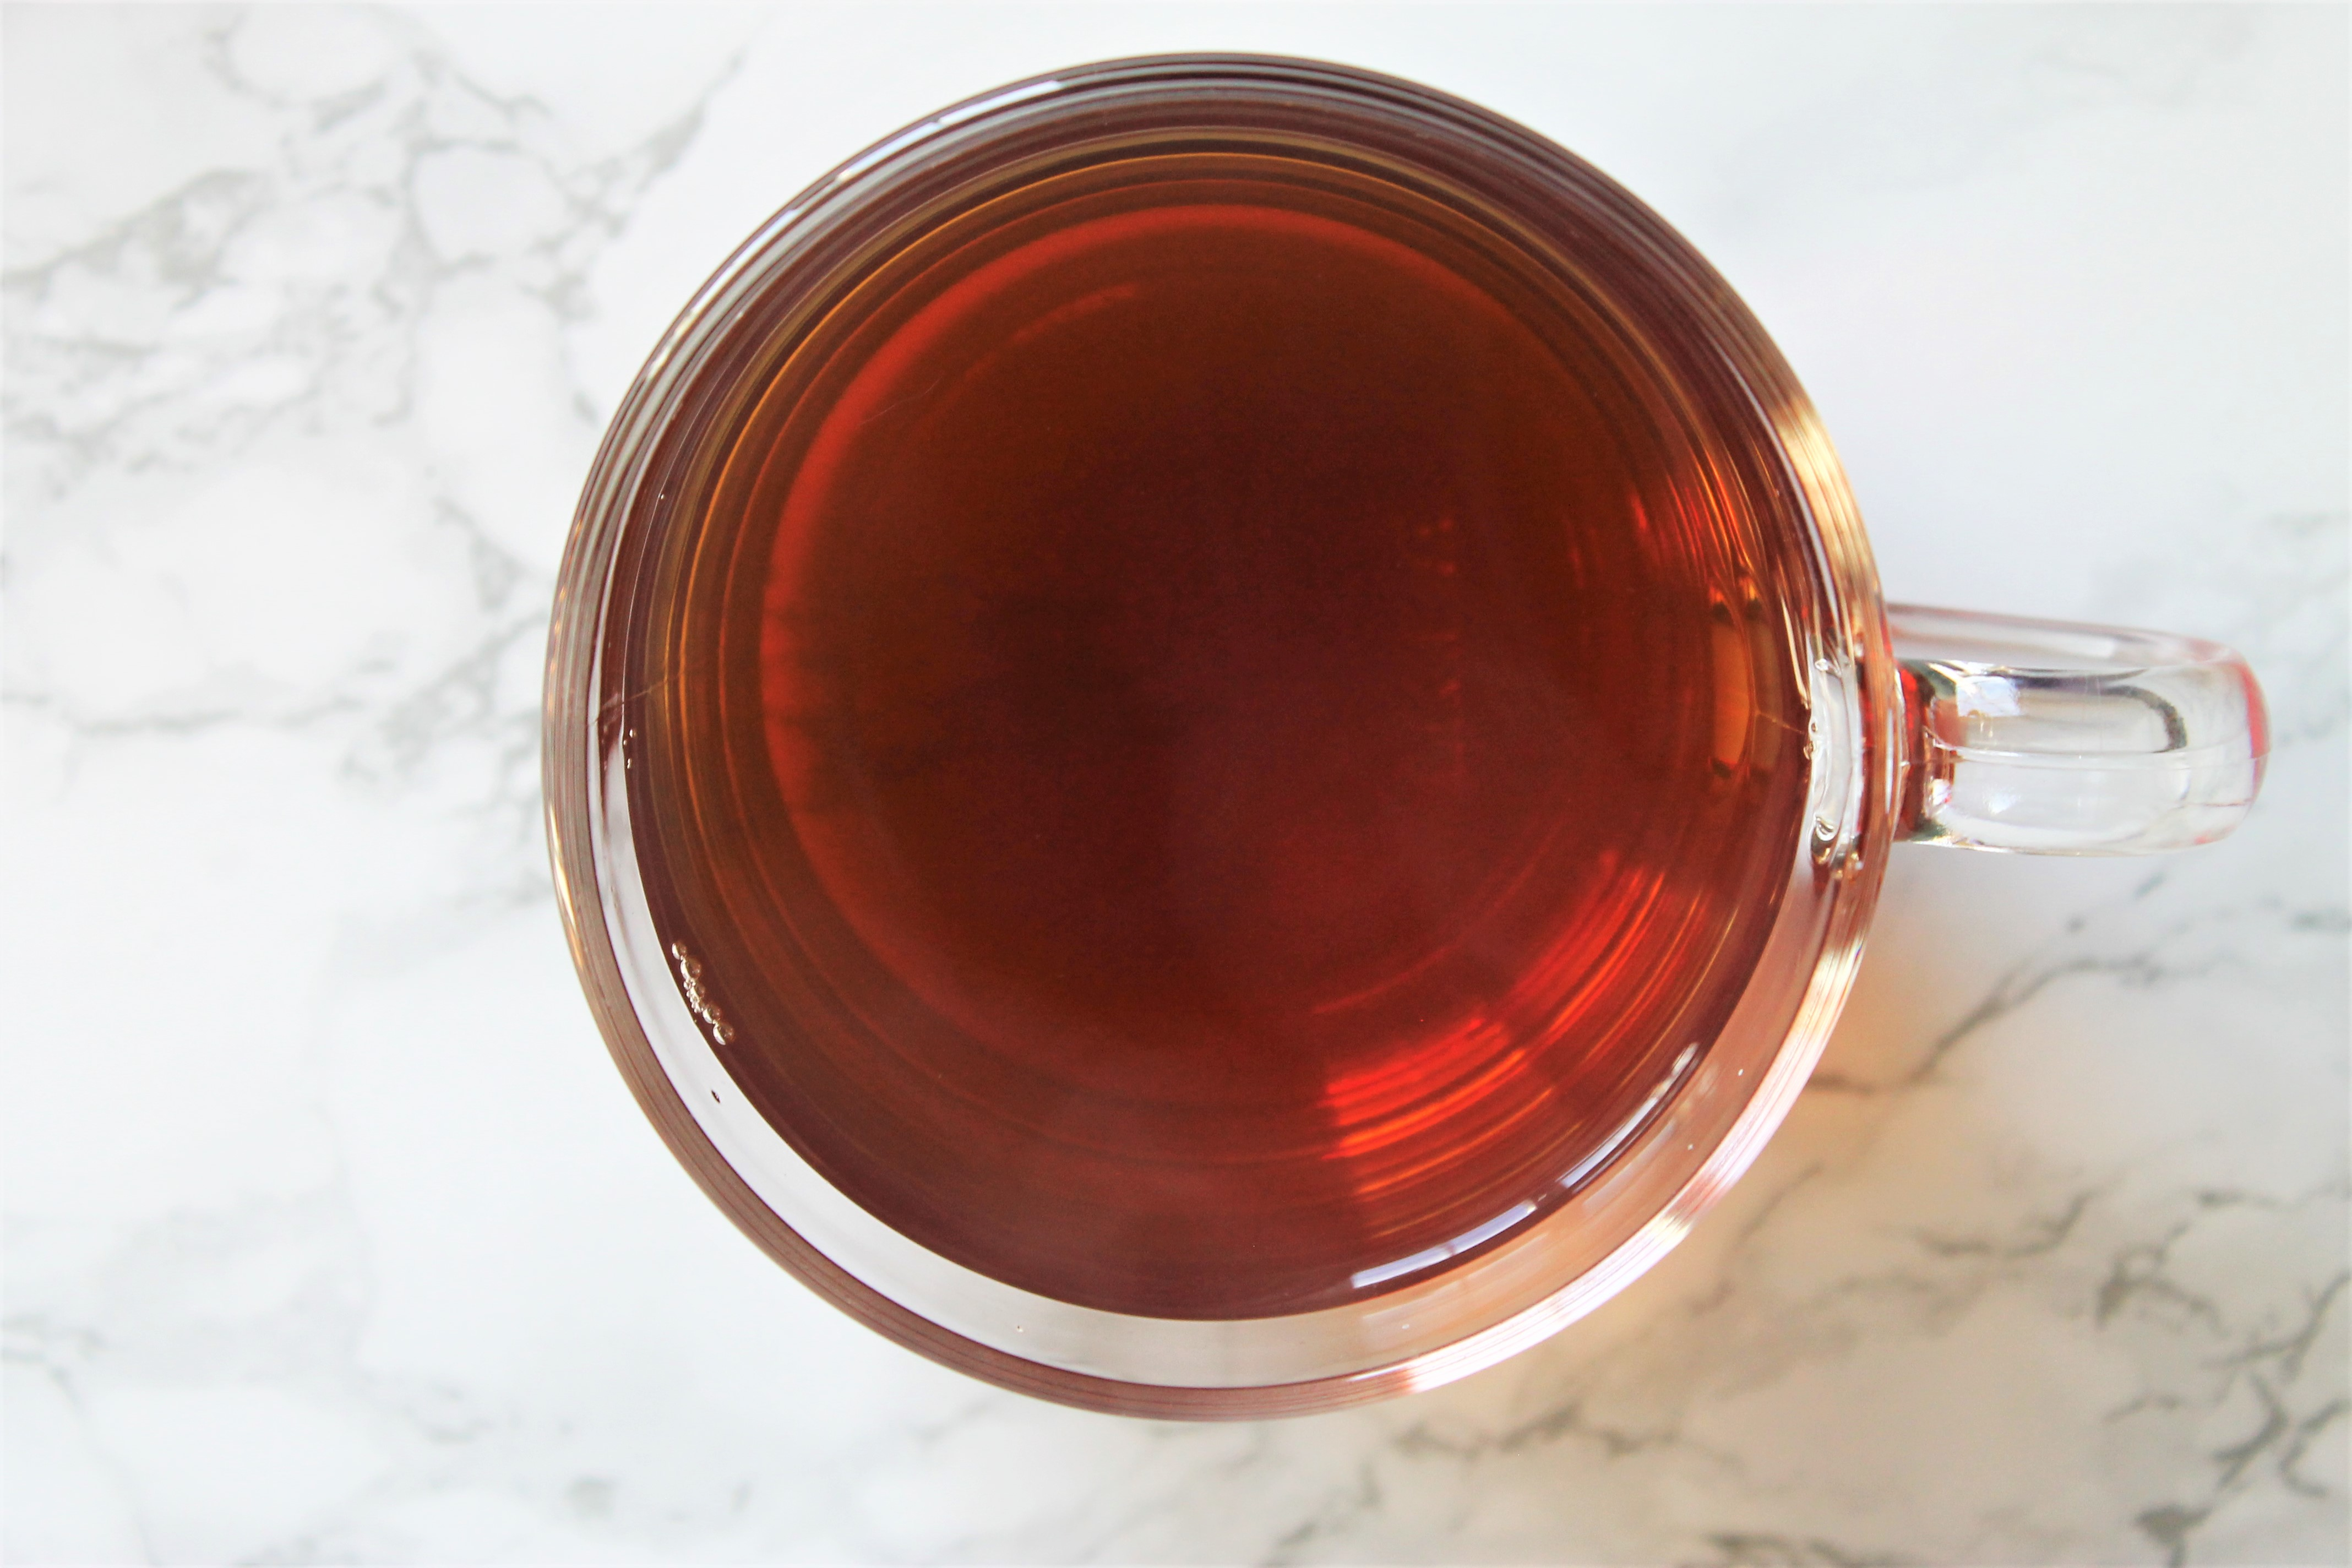 earl grey glass teacup